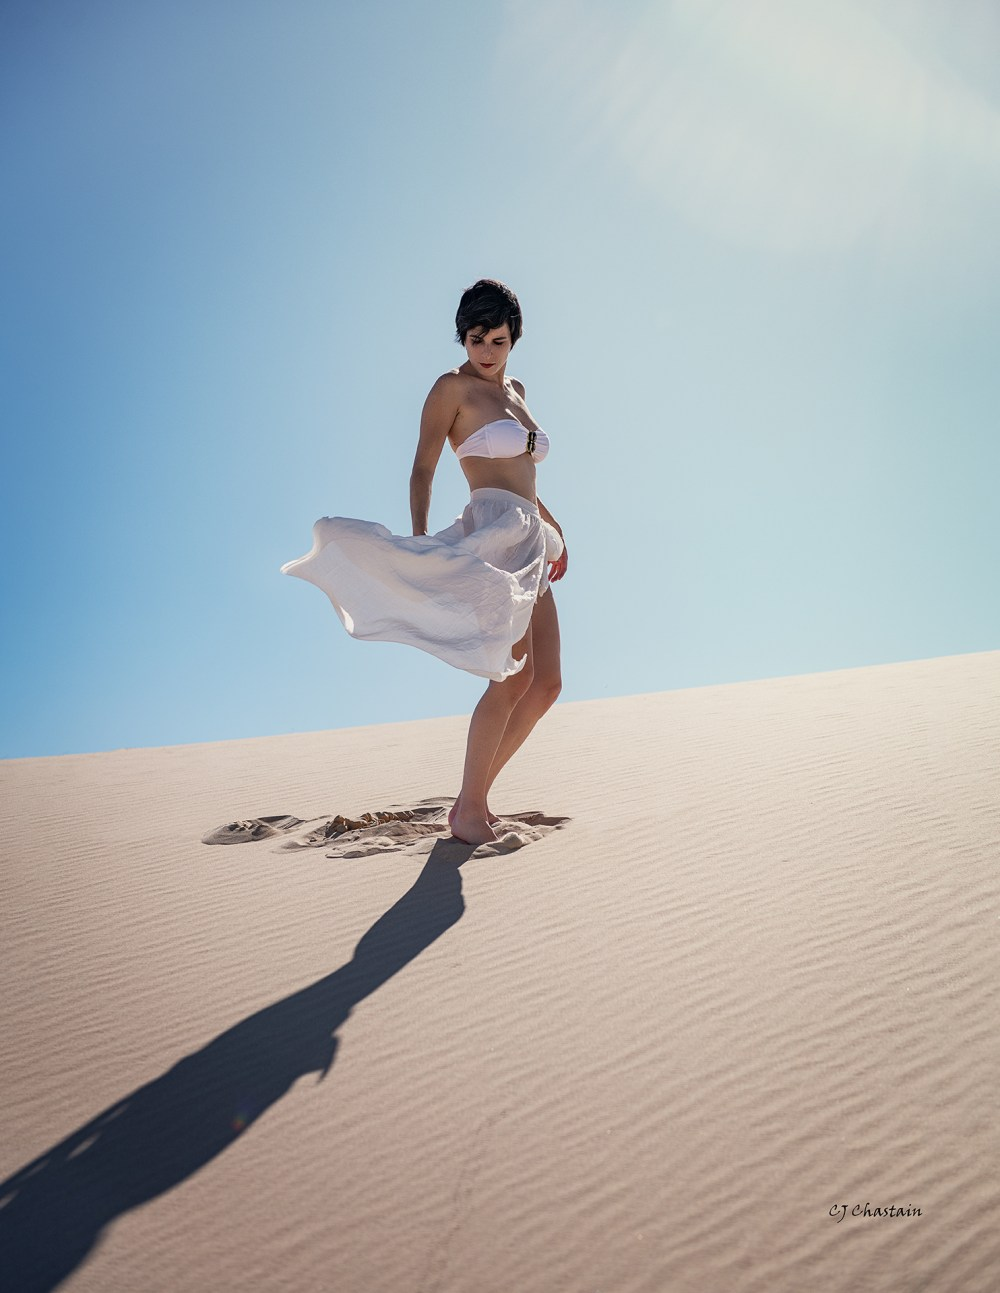 Masha Rizzi, 2019, by photographer Clint Chastain